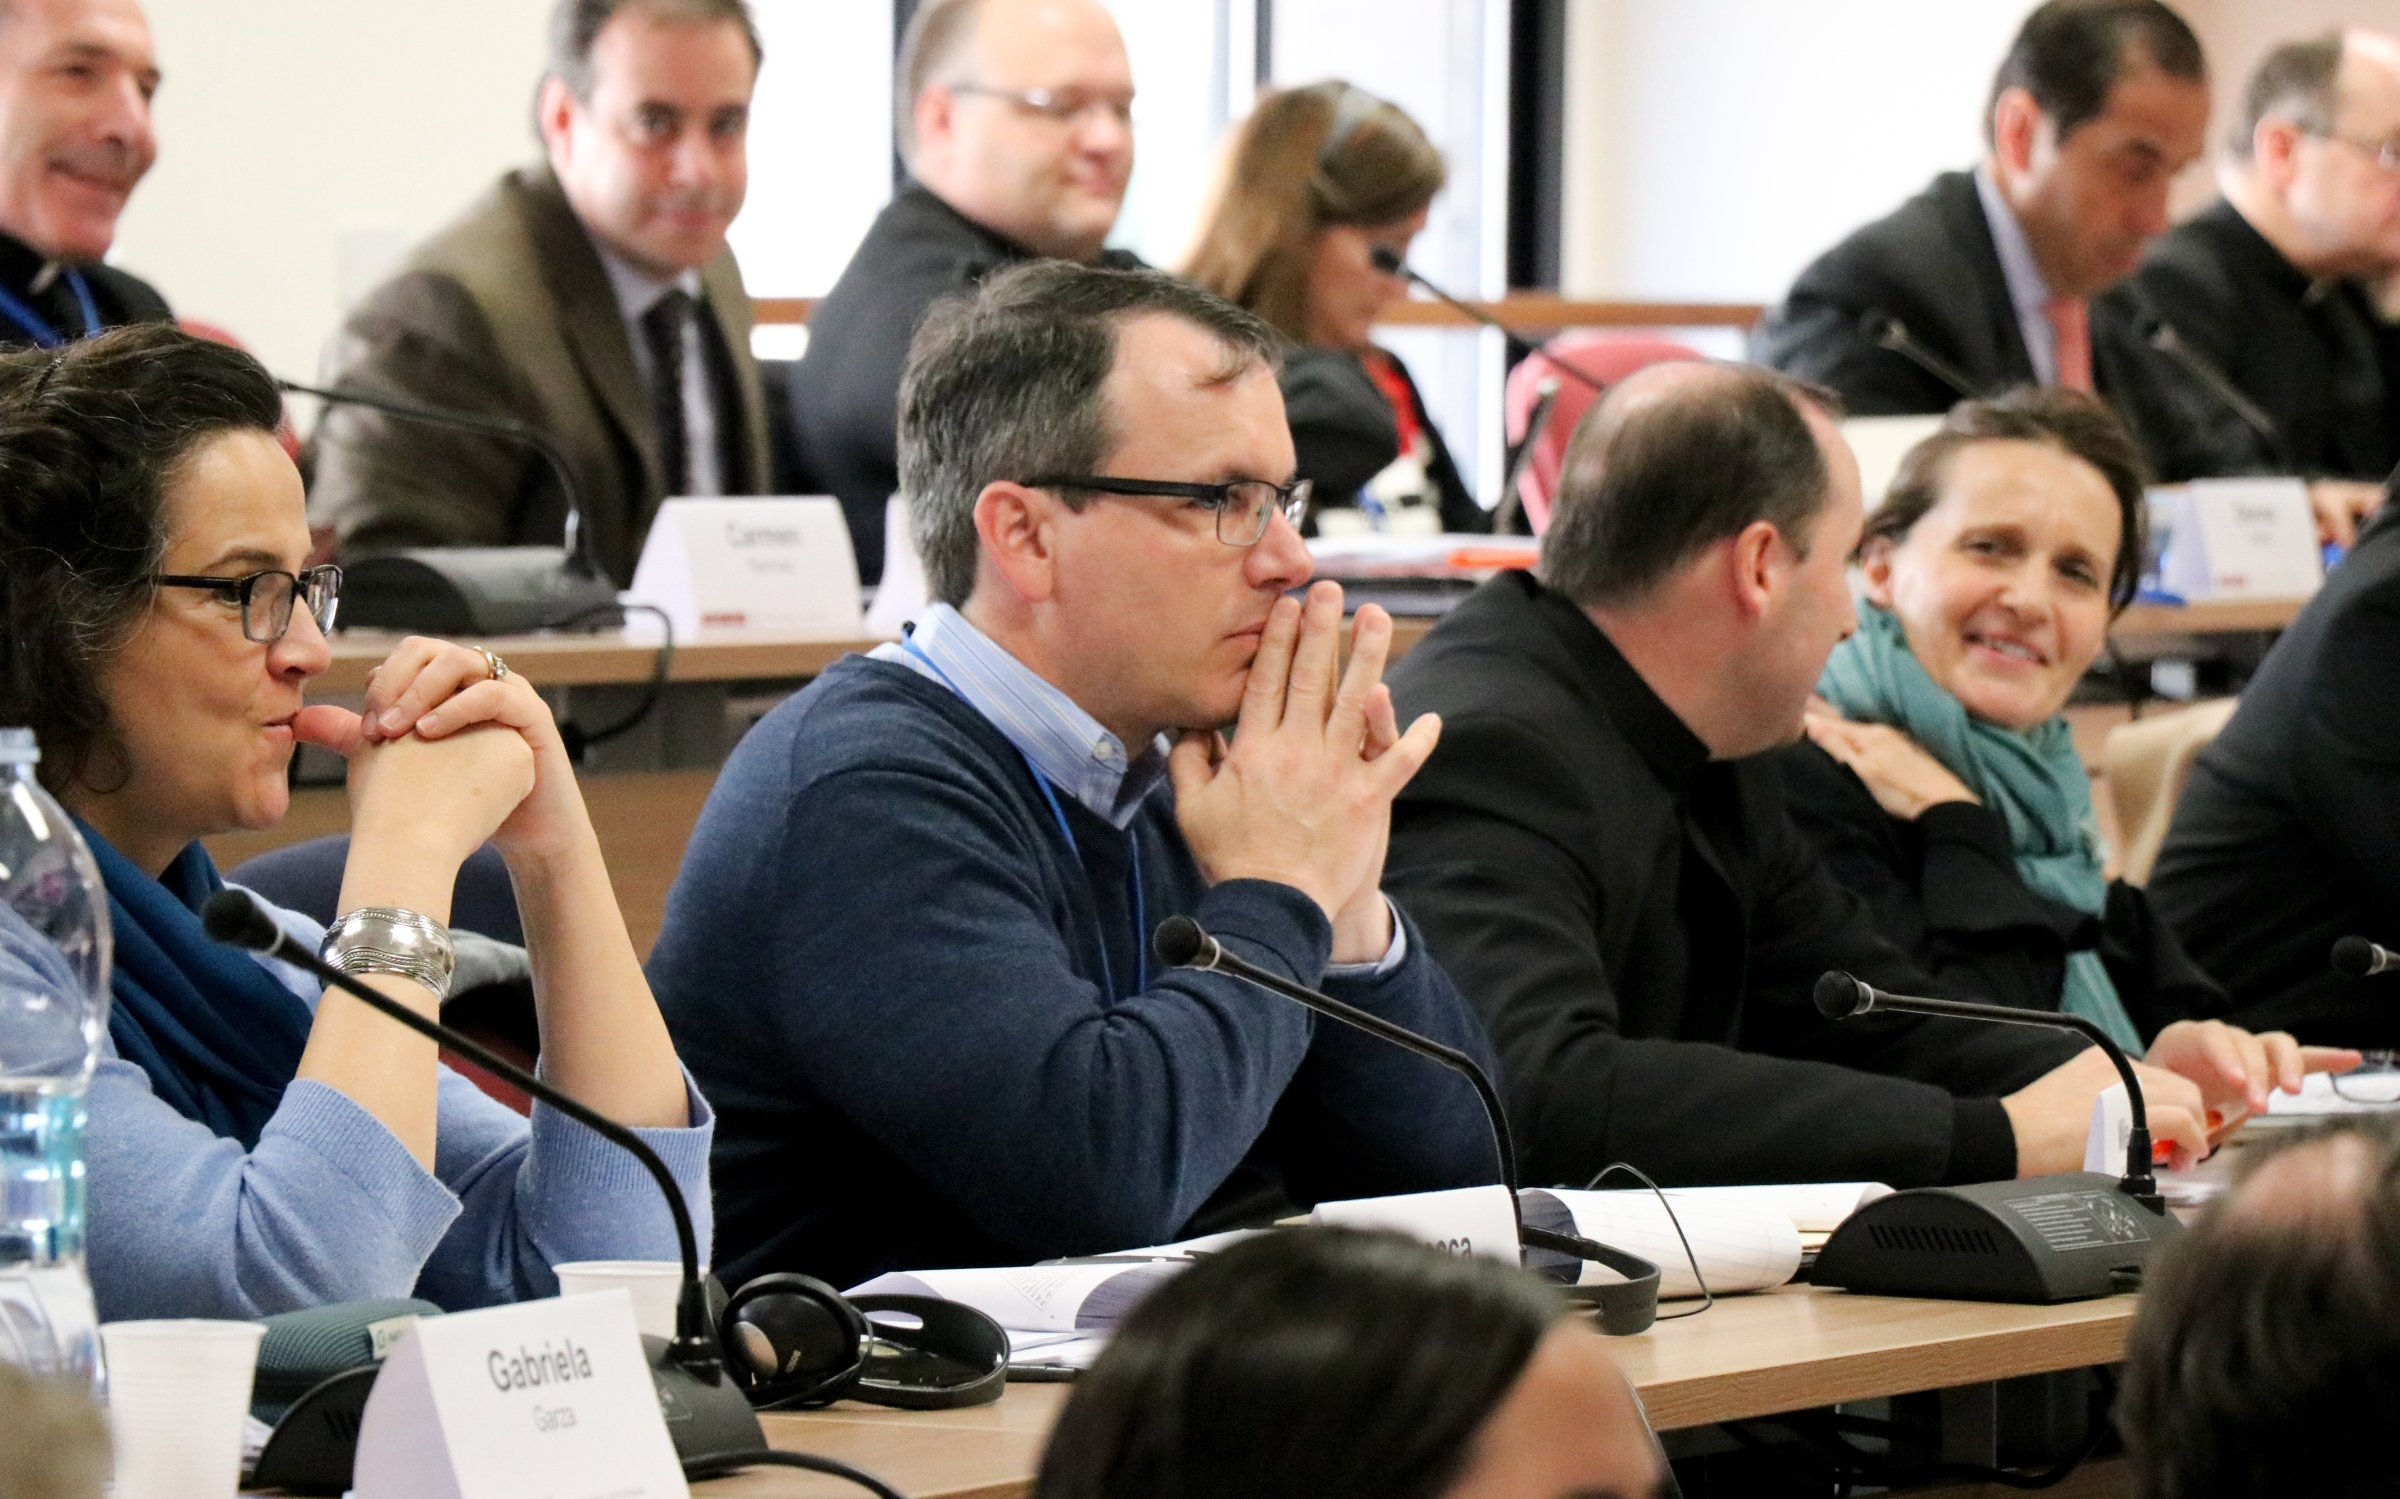 2018-11-29, Generalversammlung 03b.jpg